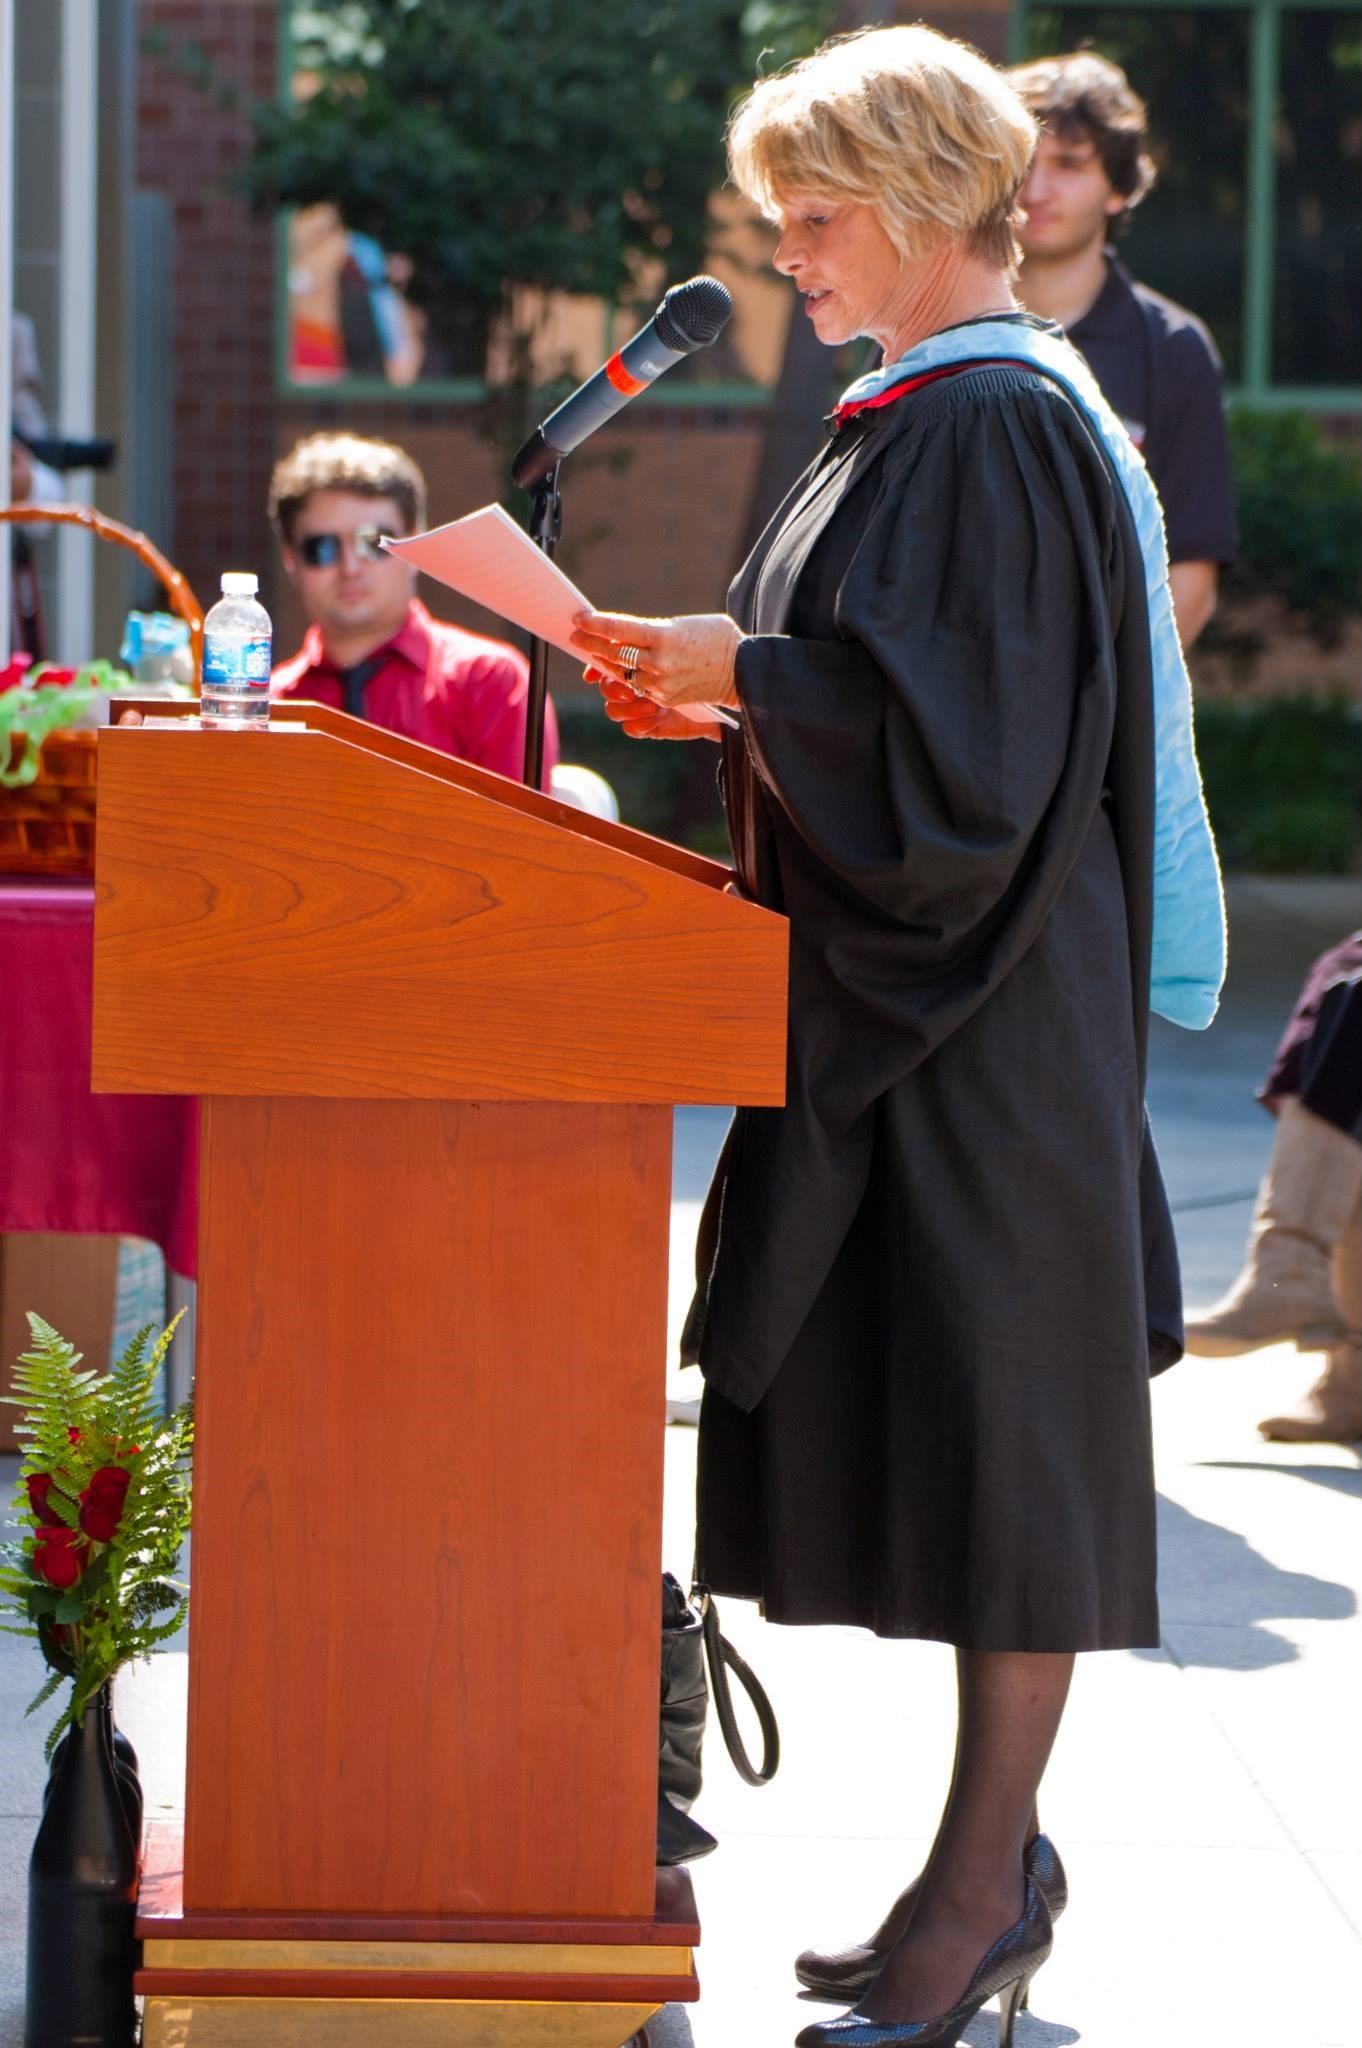 Joanne Hooding Ceremony 5 22 14 CSUN.jpg